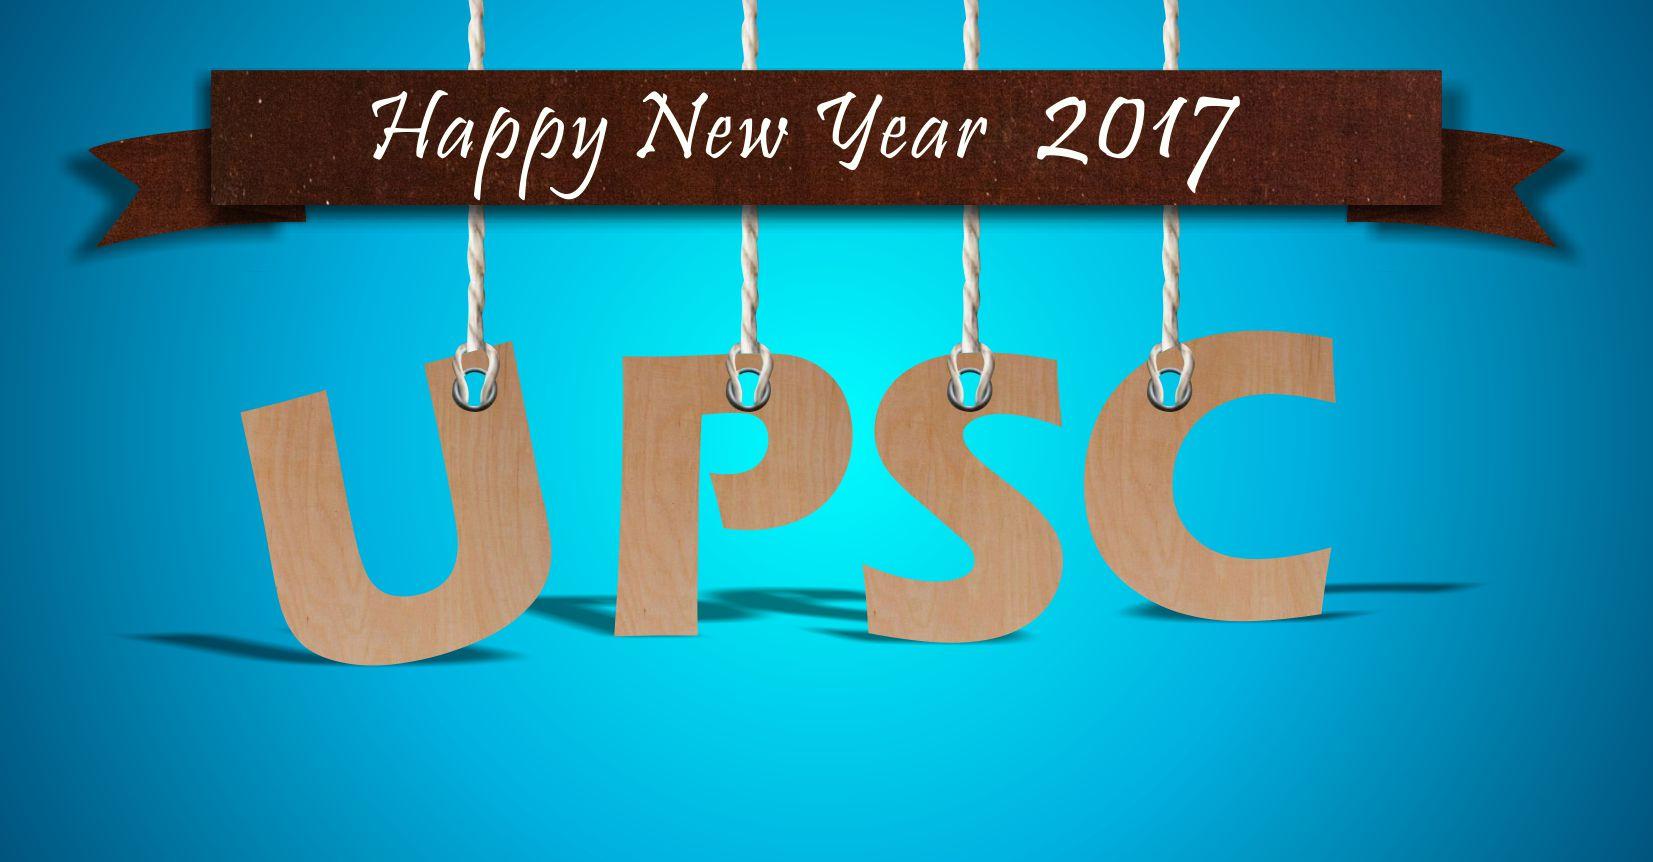 new year UPSC greeting